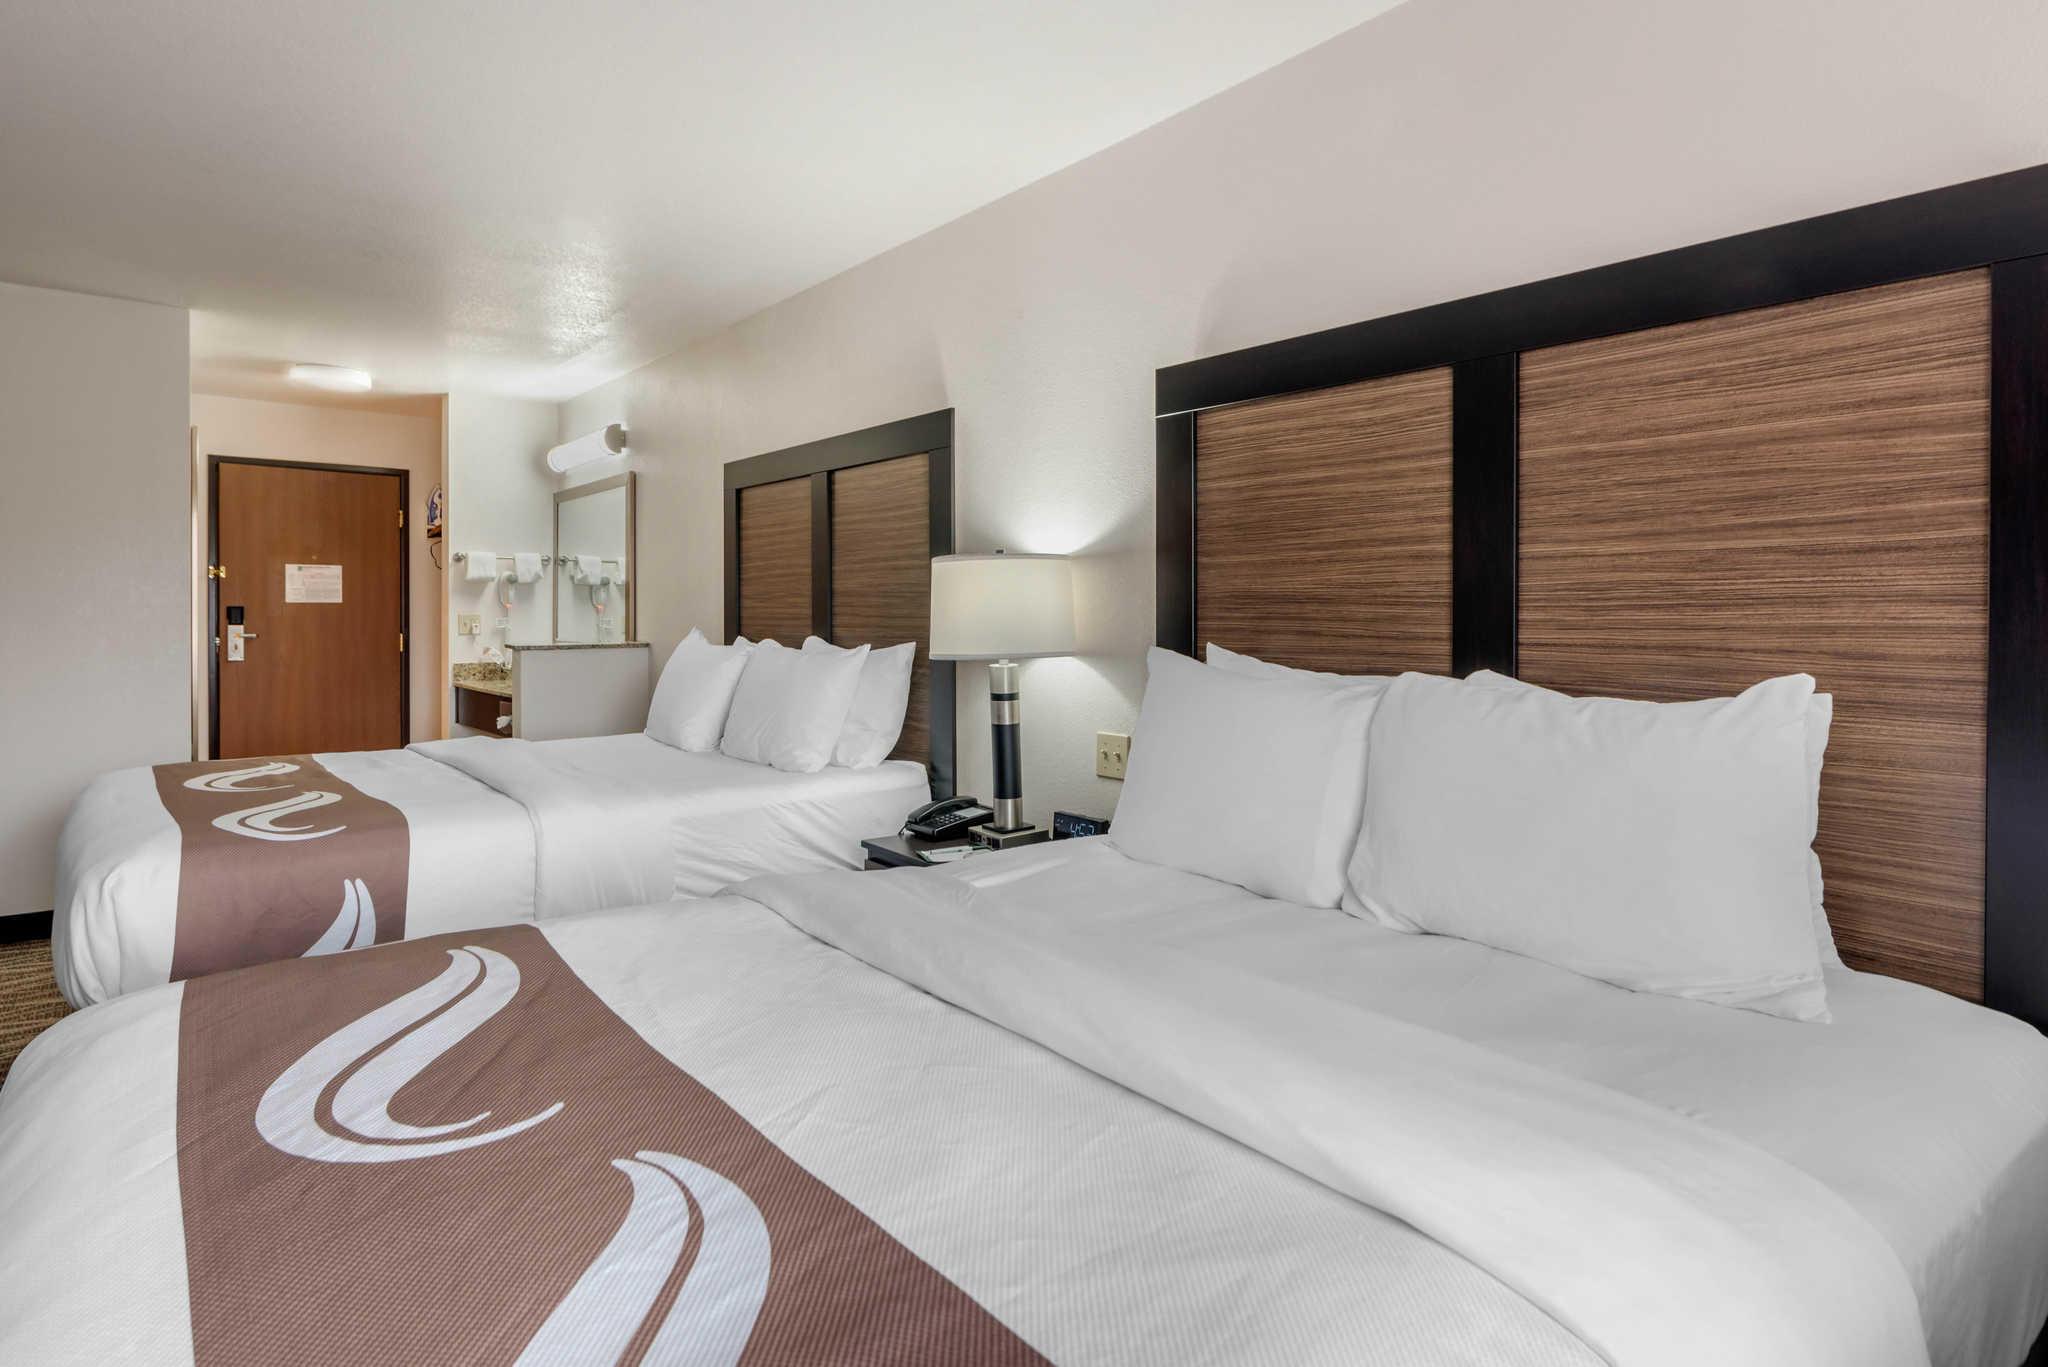 Quality Inn & Suites image 27